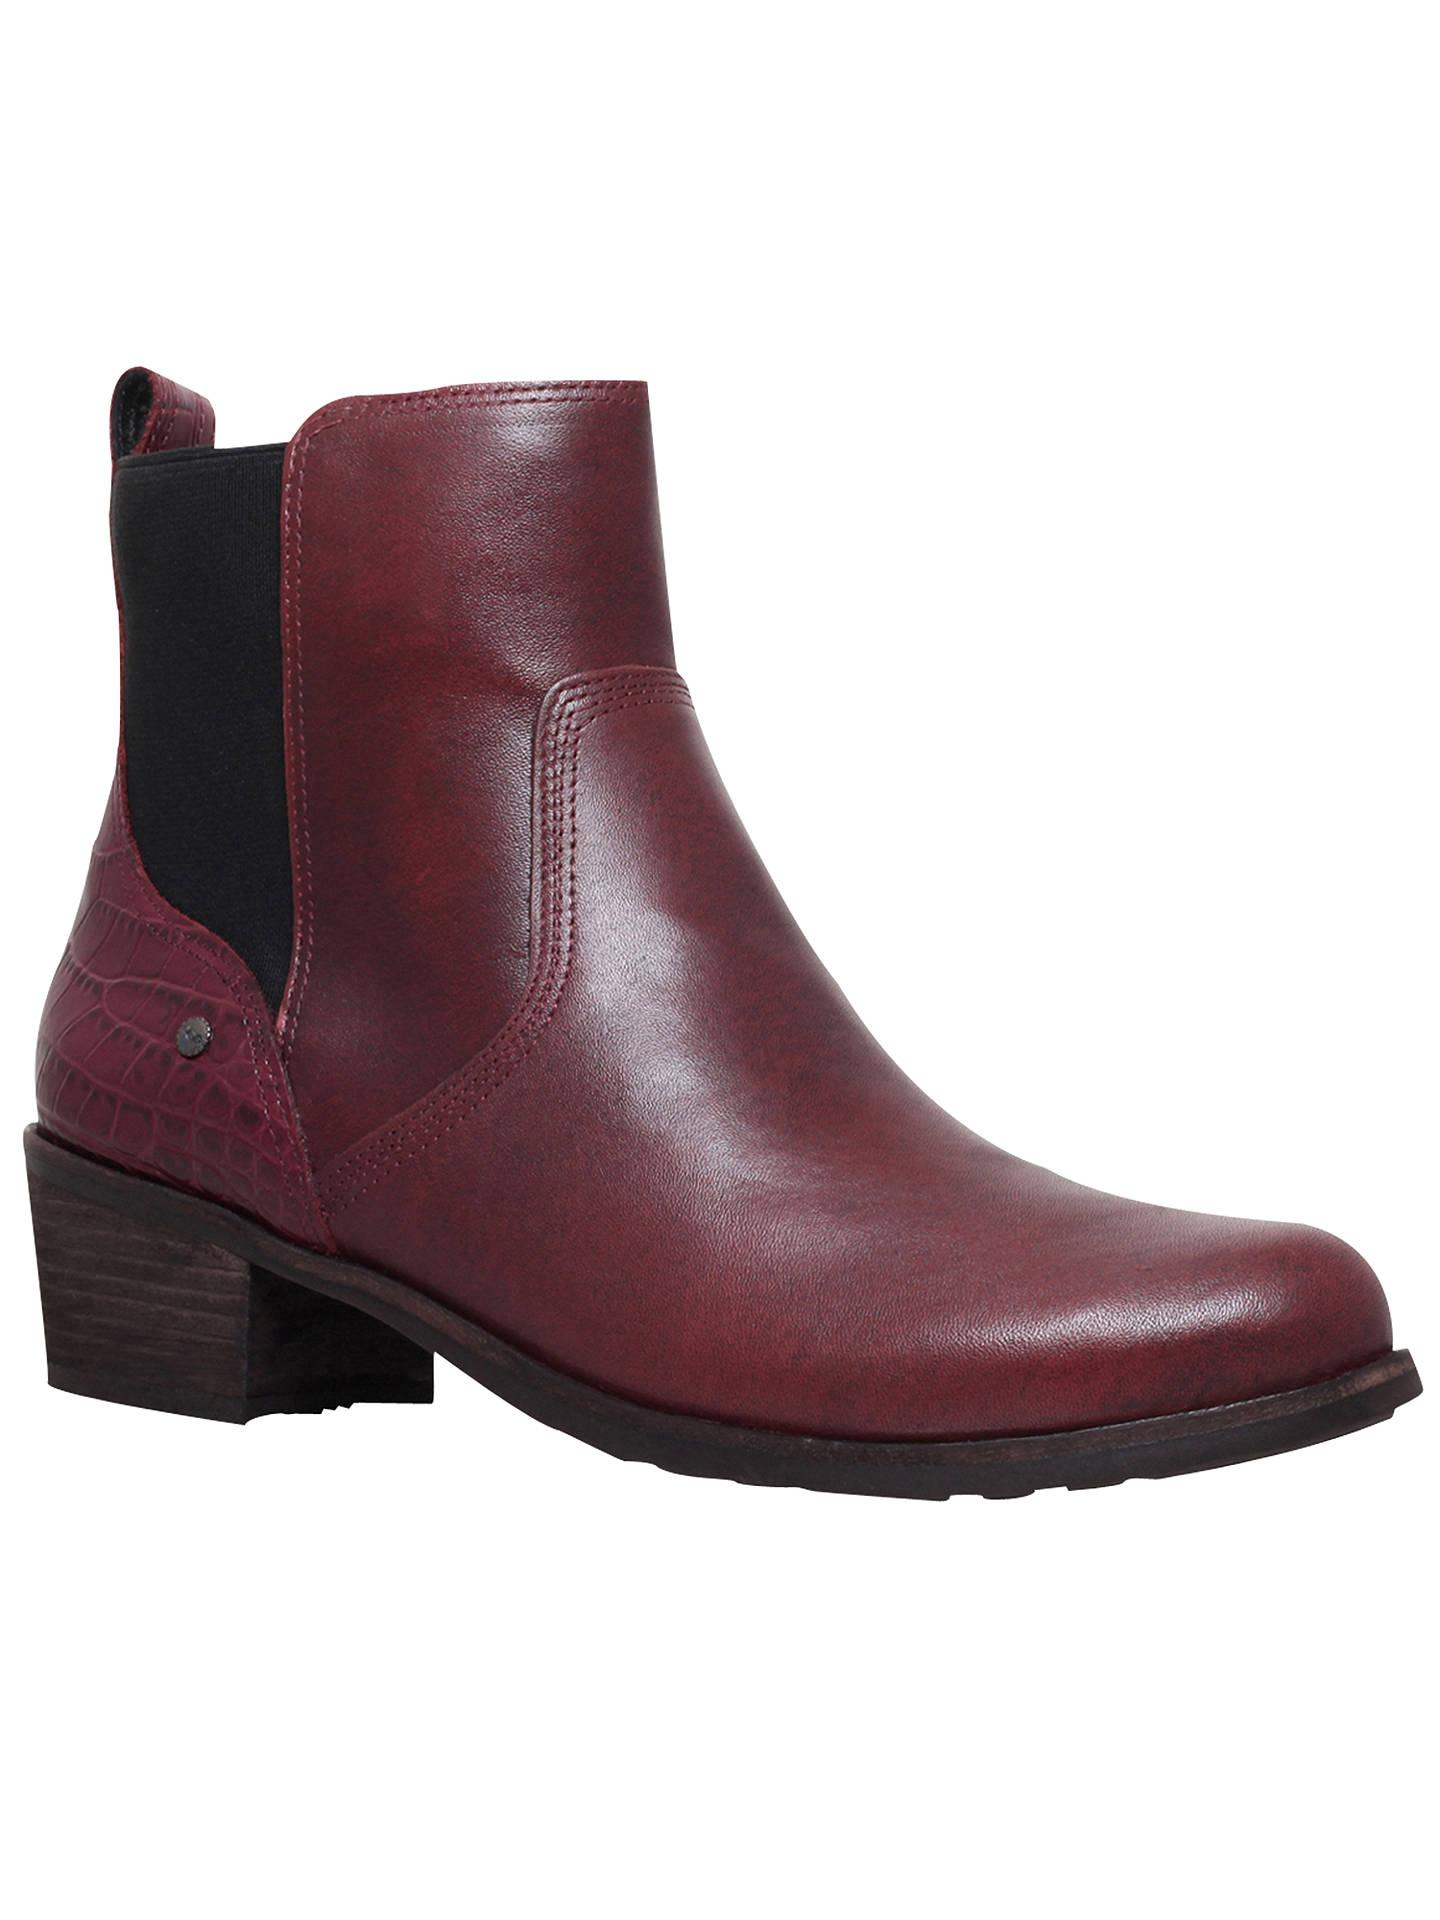 UGG Keller Croc Ankle Boots at John Lewis   Partners 4f40df8f4f72c